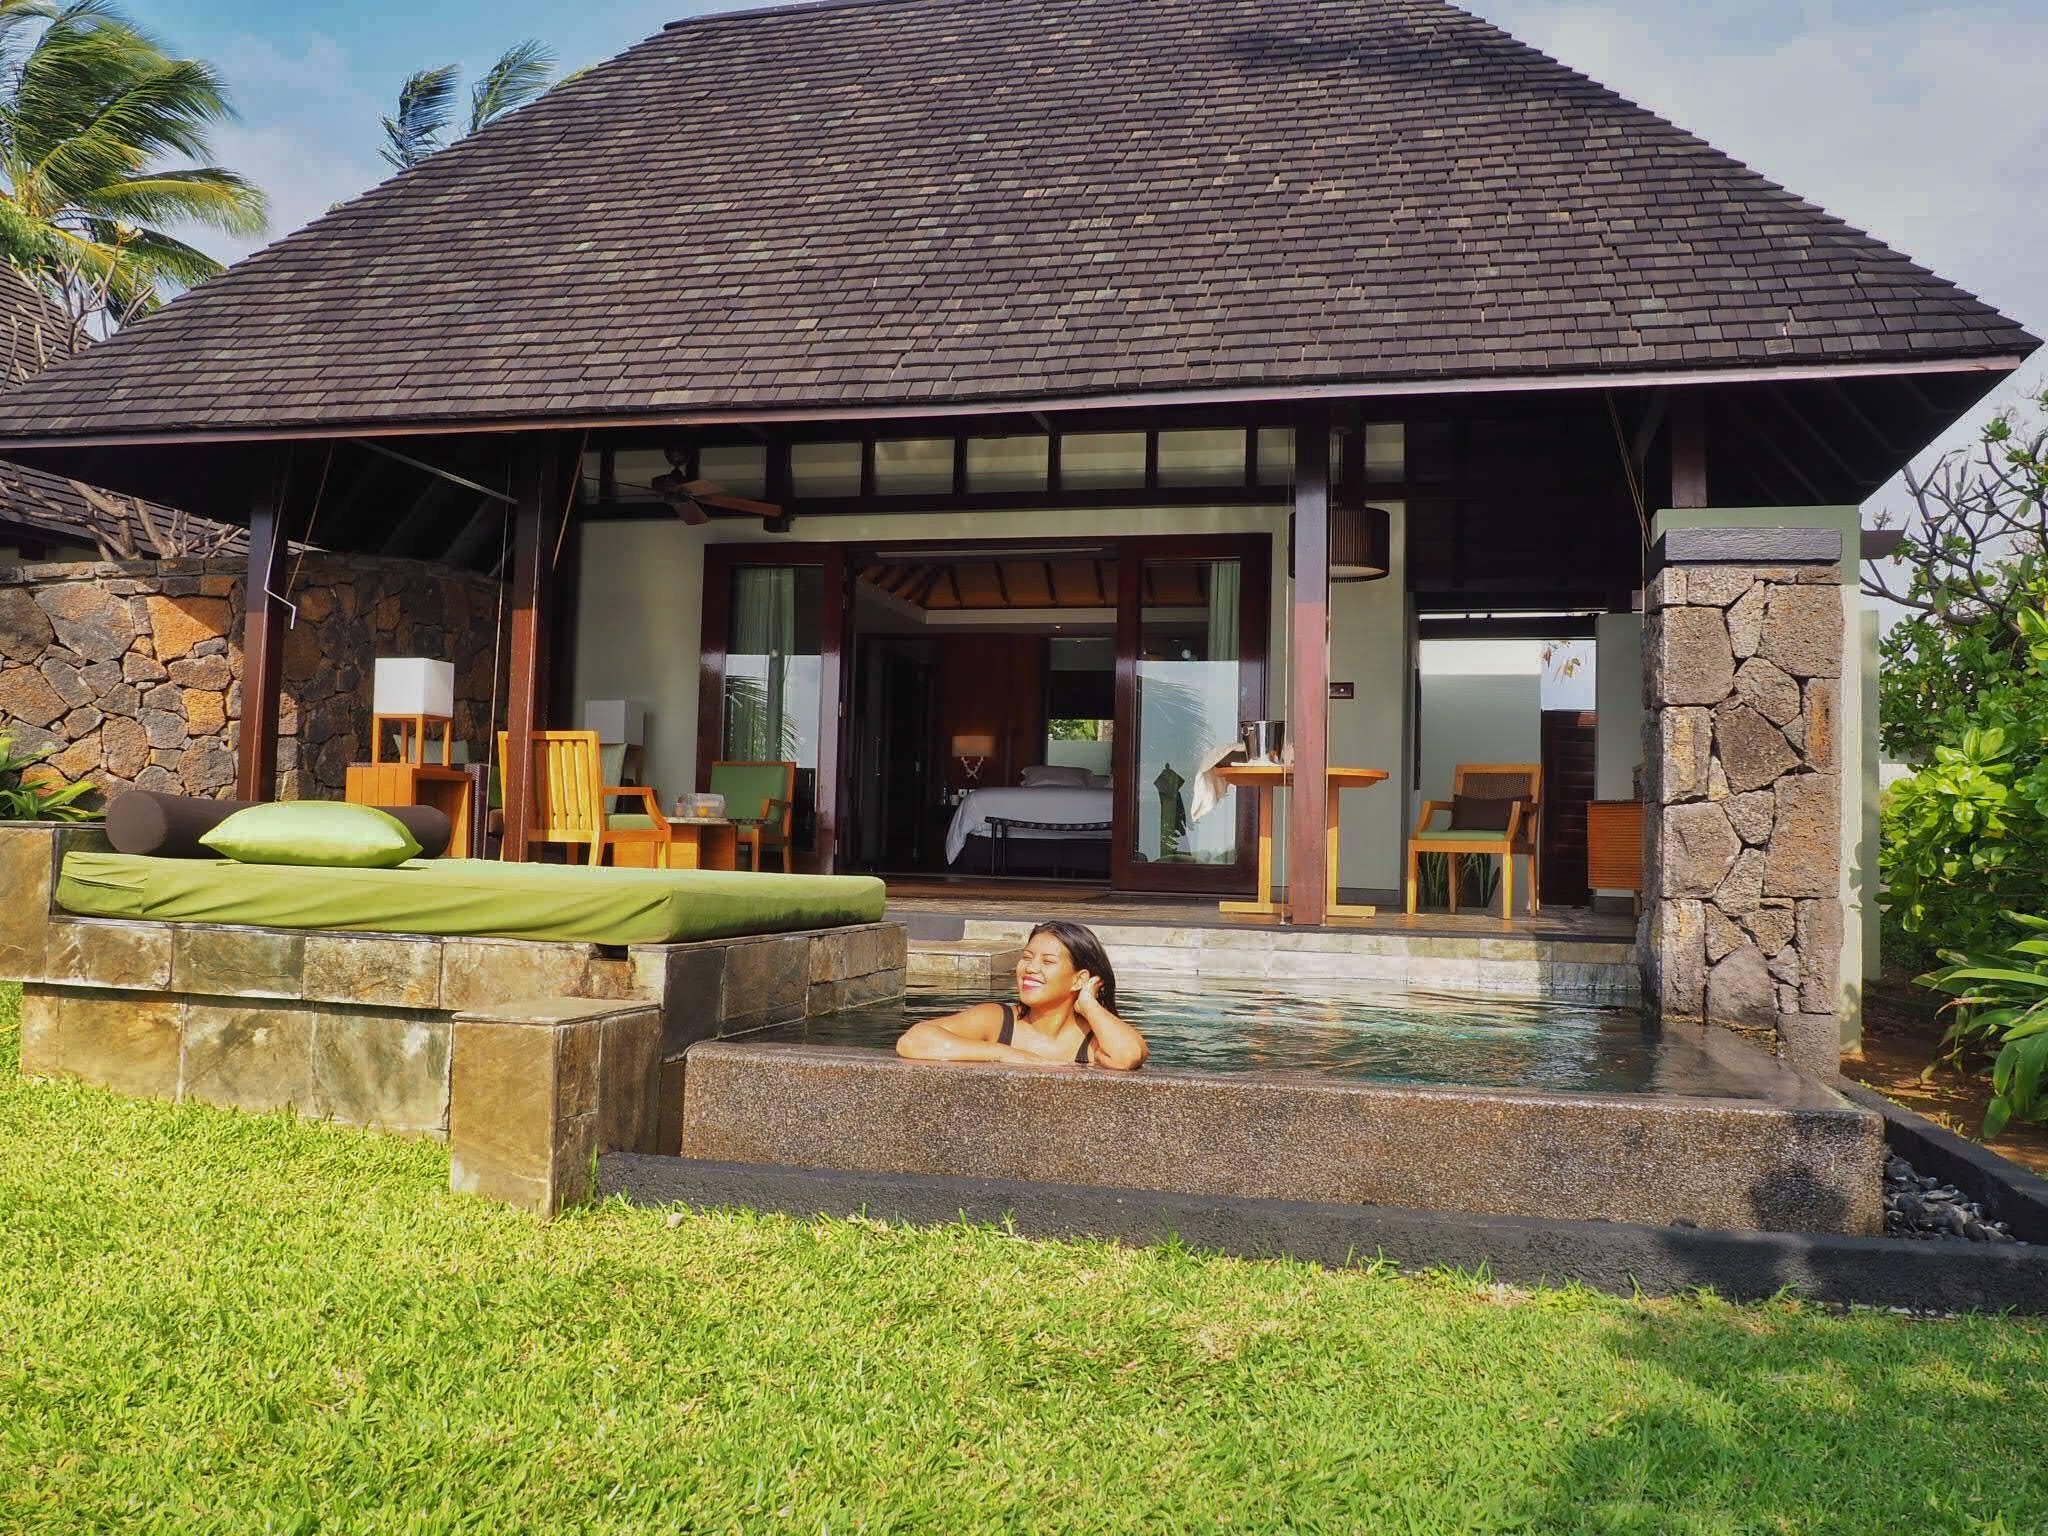 Best Luxury Hotel in East Mauritius – Four Seasons Resort at Anahita 22.jpg